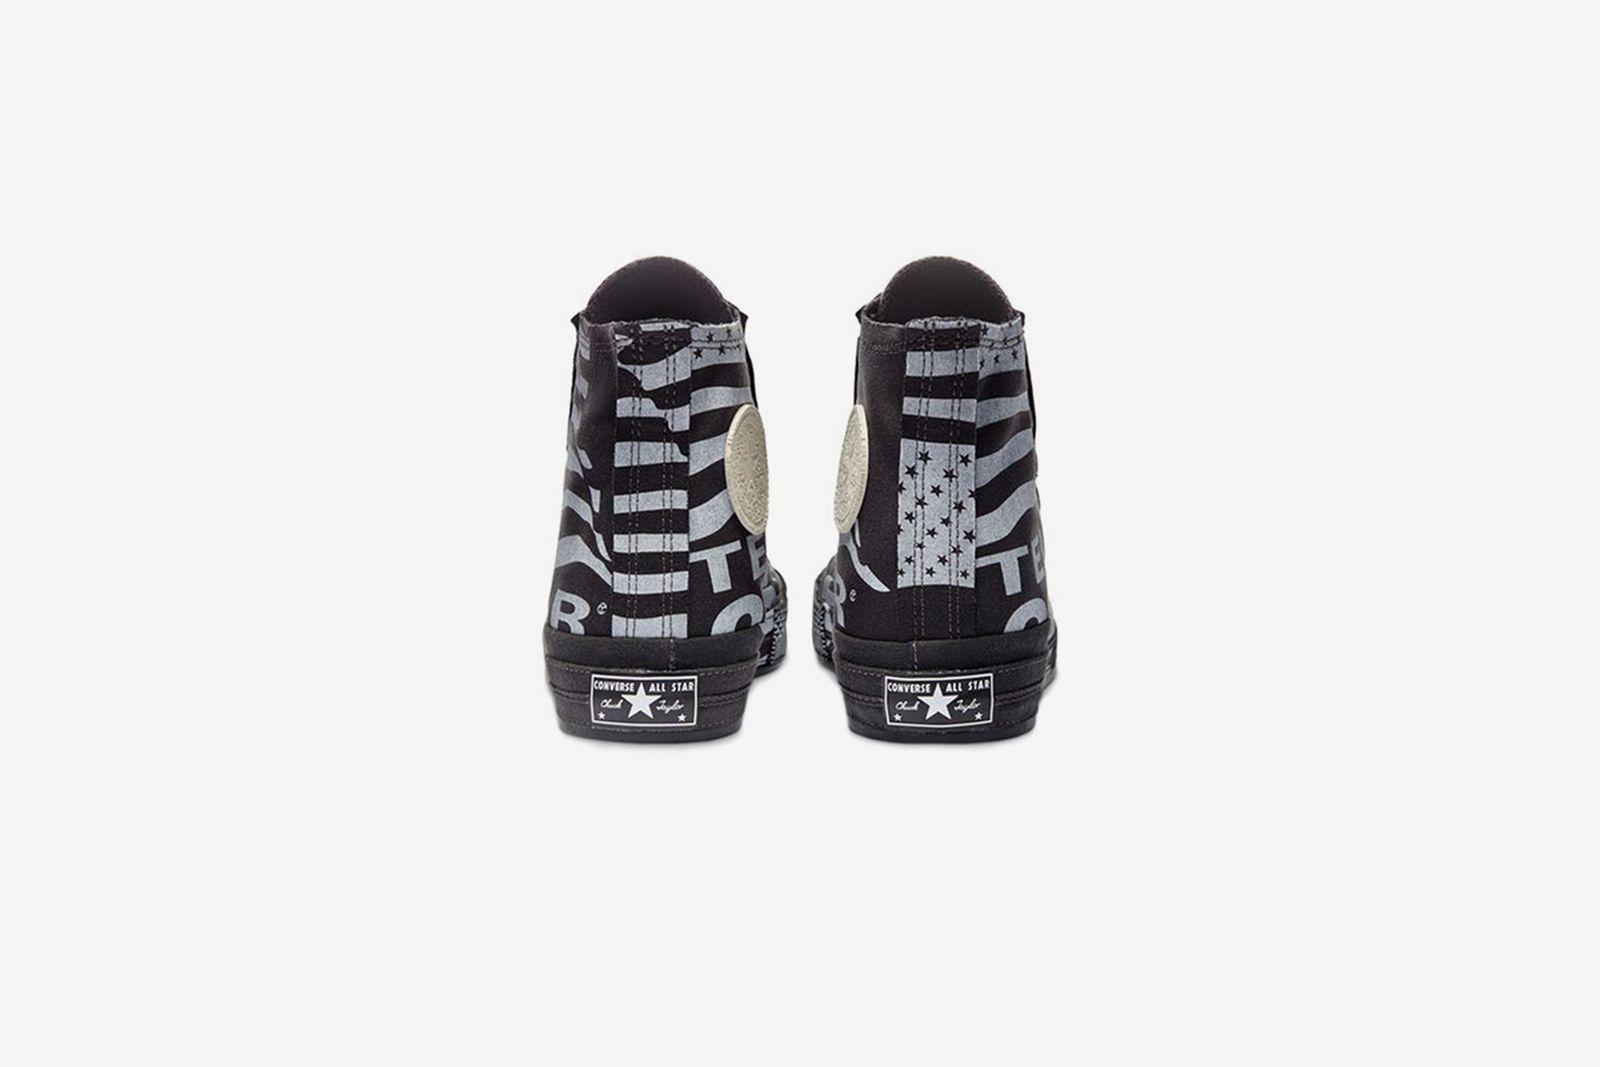 telfar-converse-chuck-70-release-date-price-10